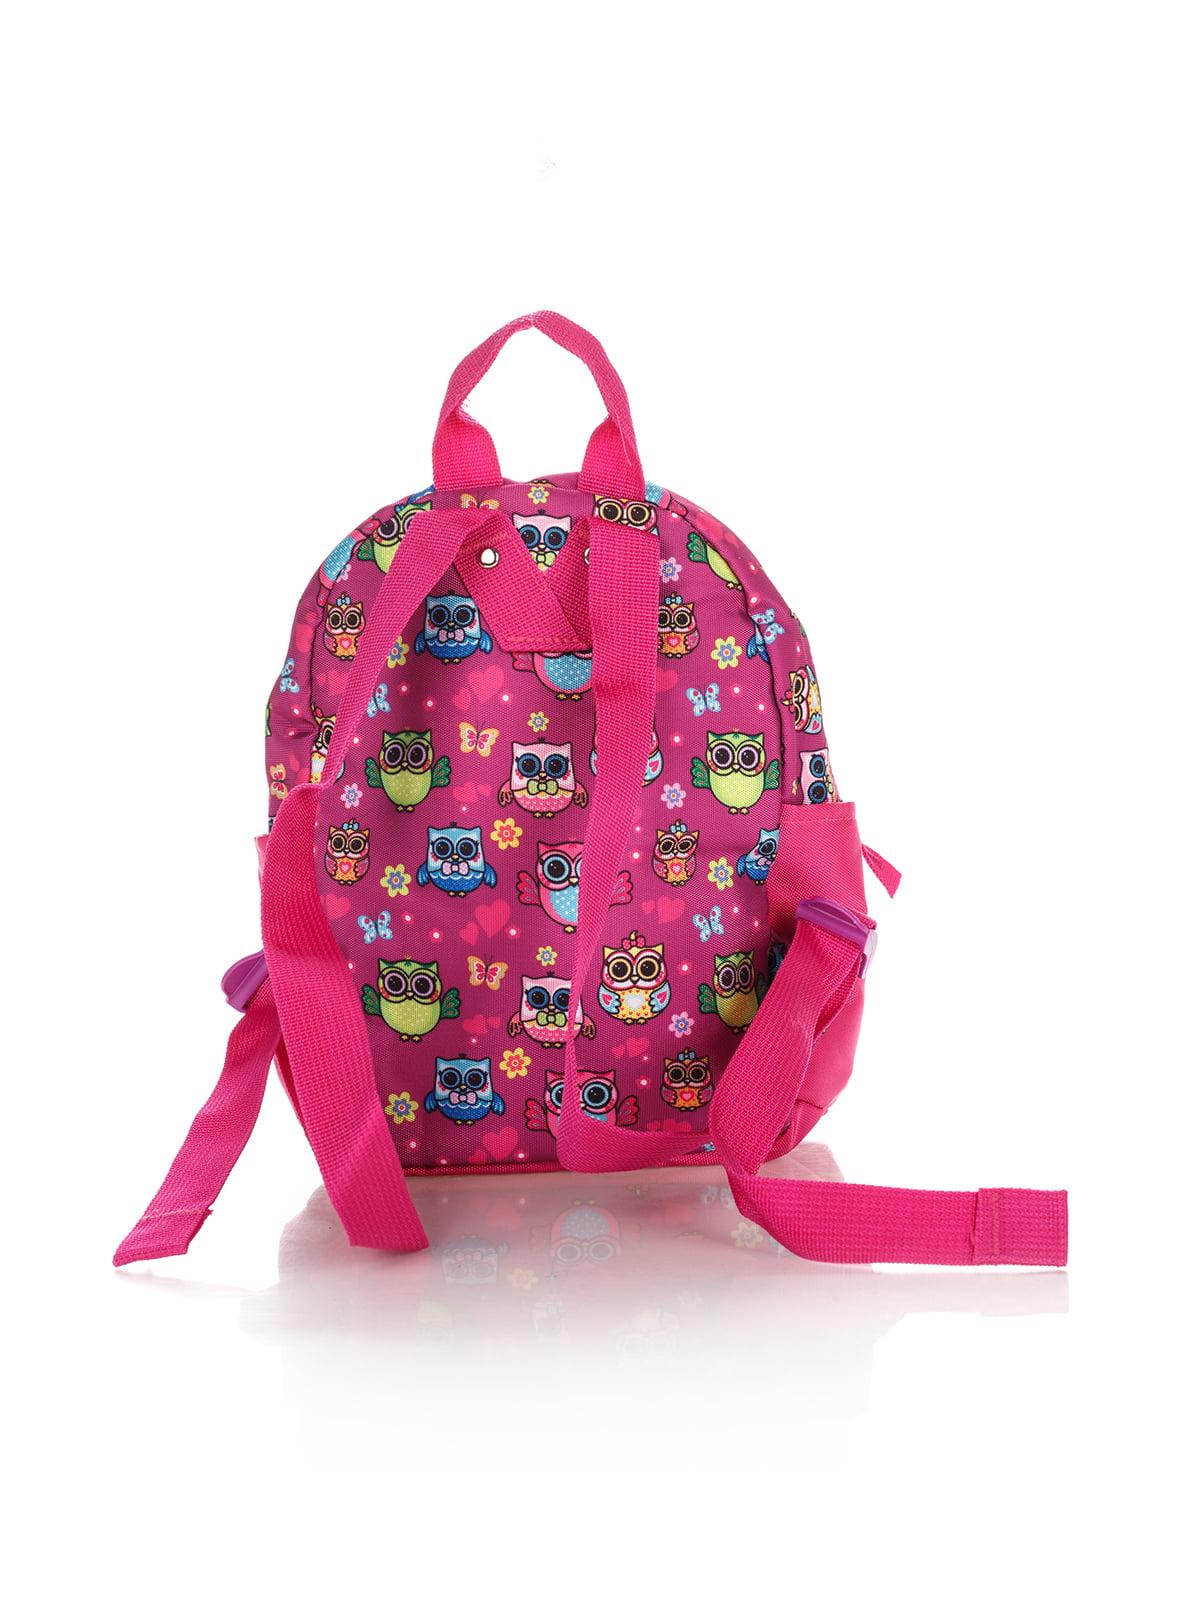 Рюкзак рожевий в принт | 4284719 | фото 2